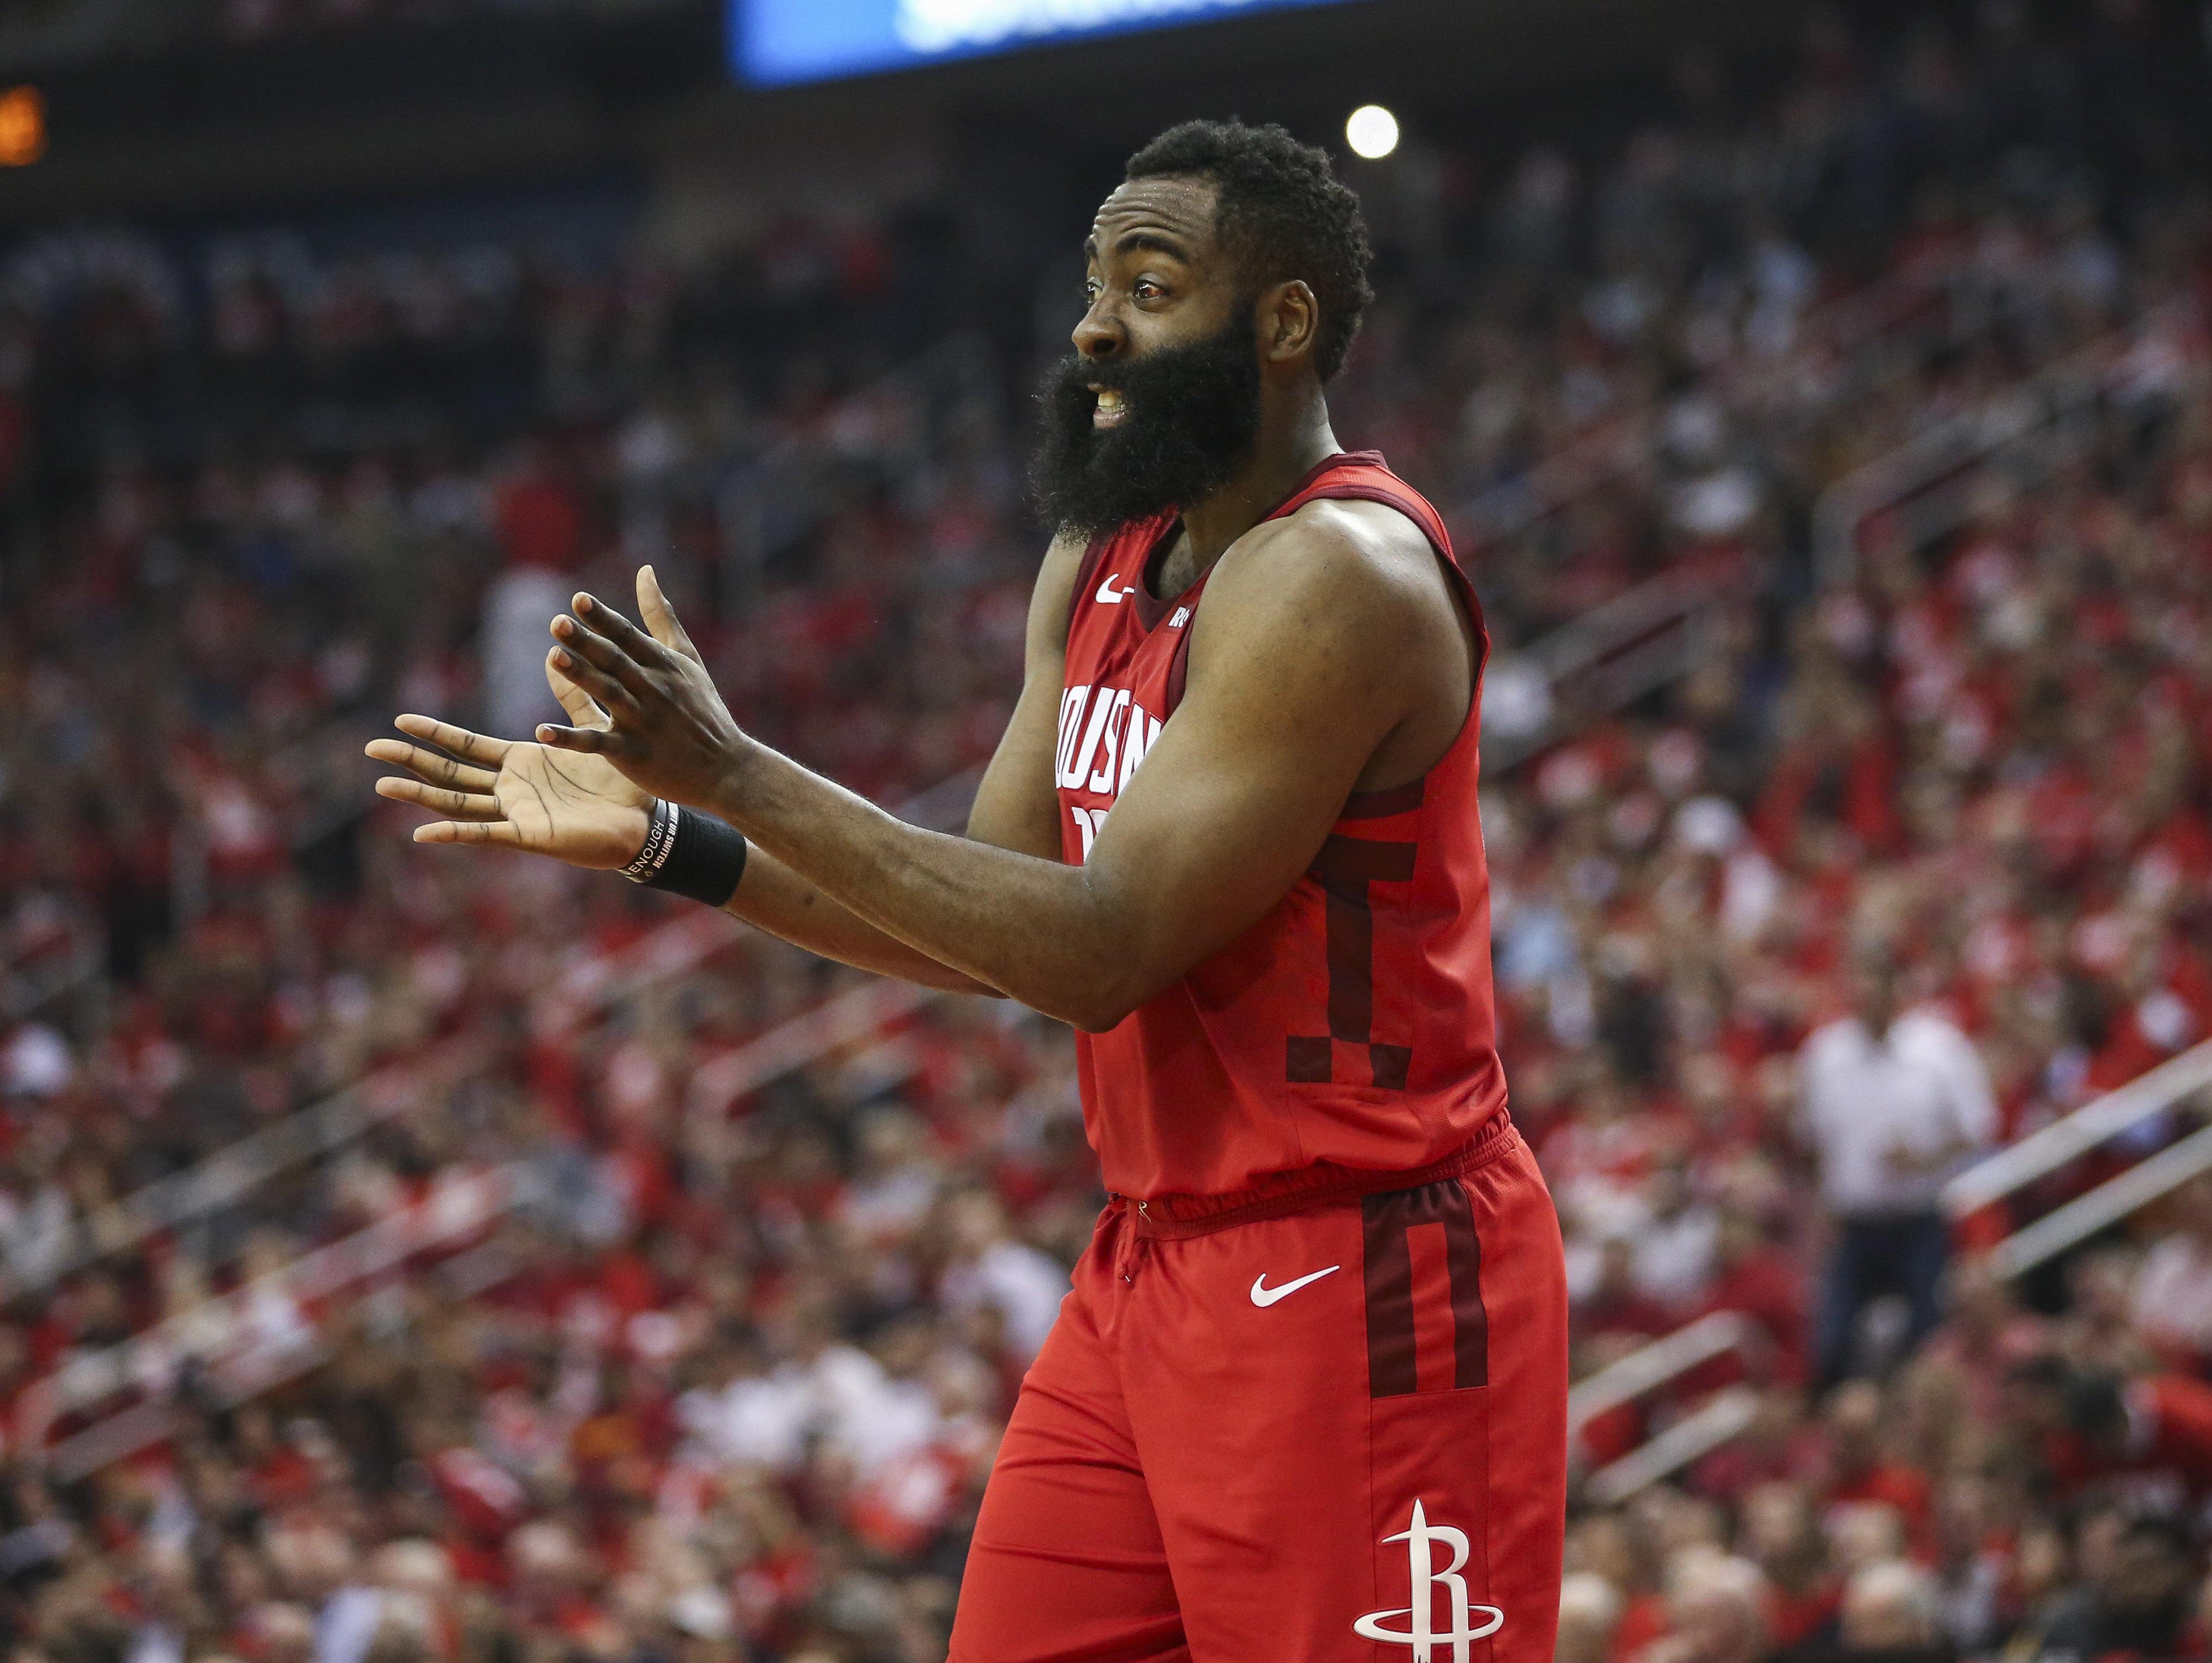 Rockets' James Harden remains unhappy after preseason